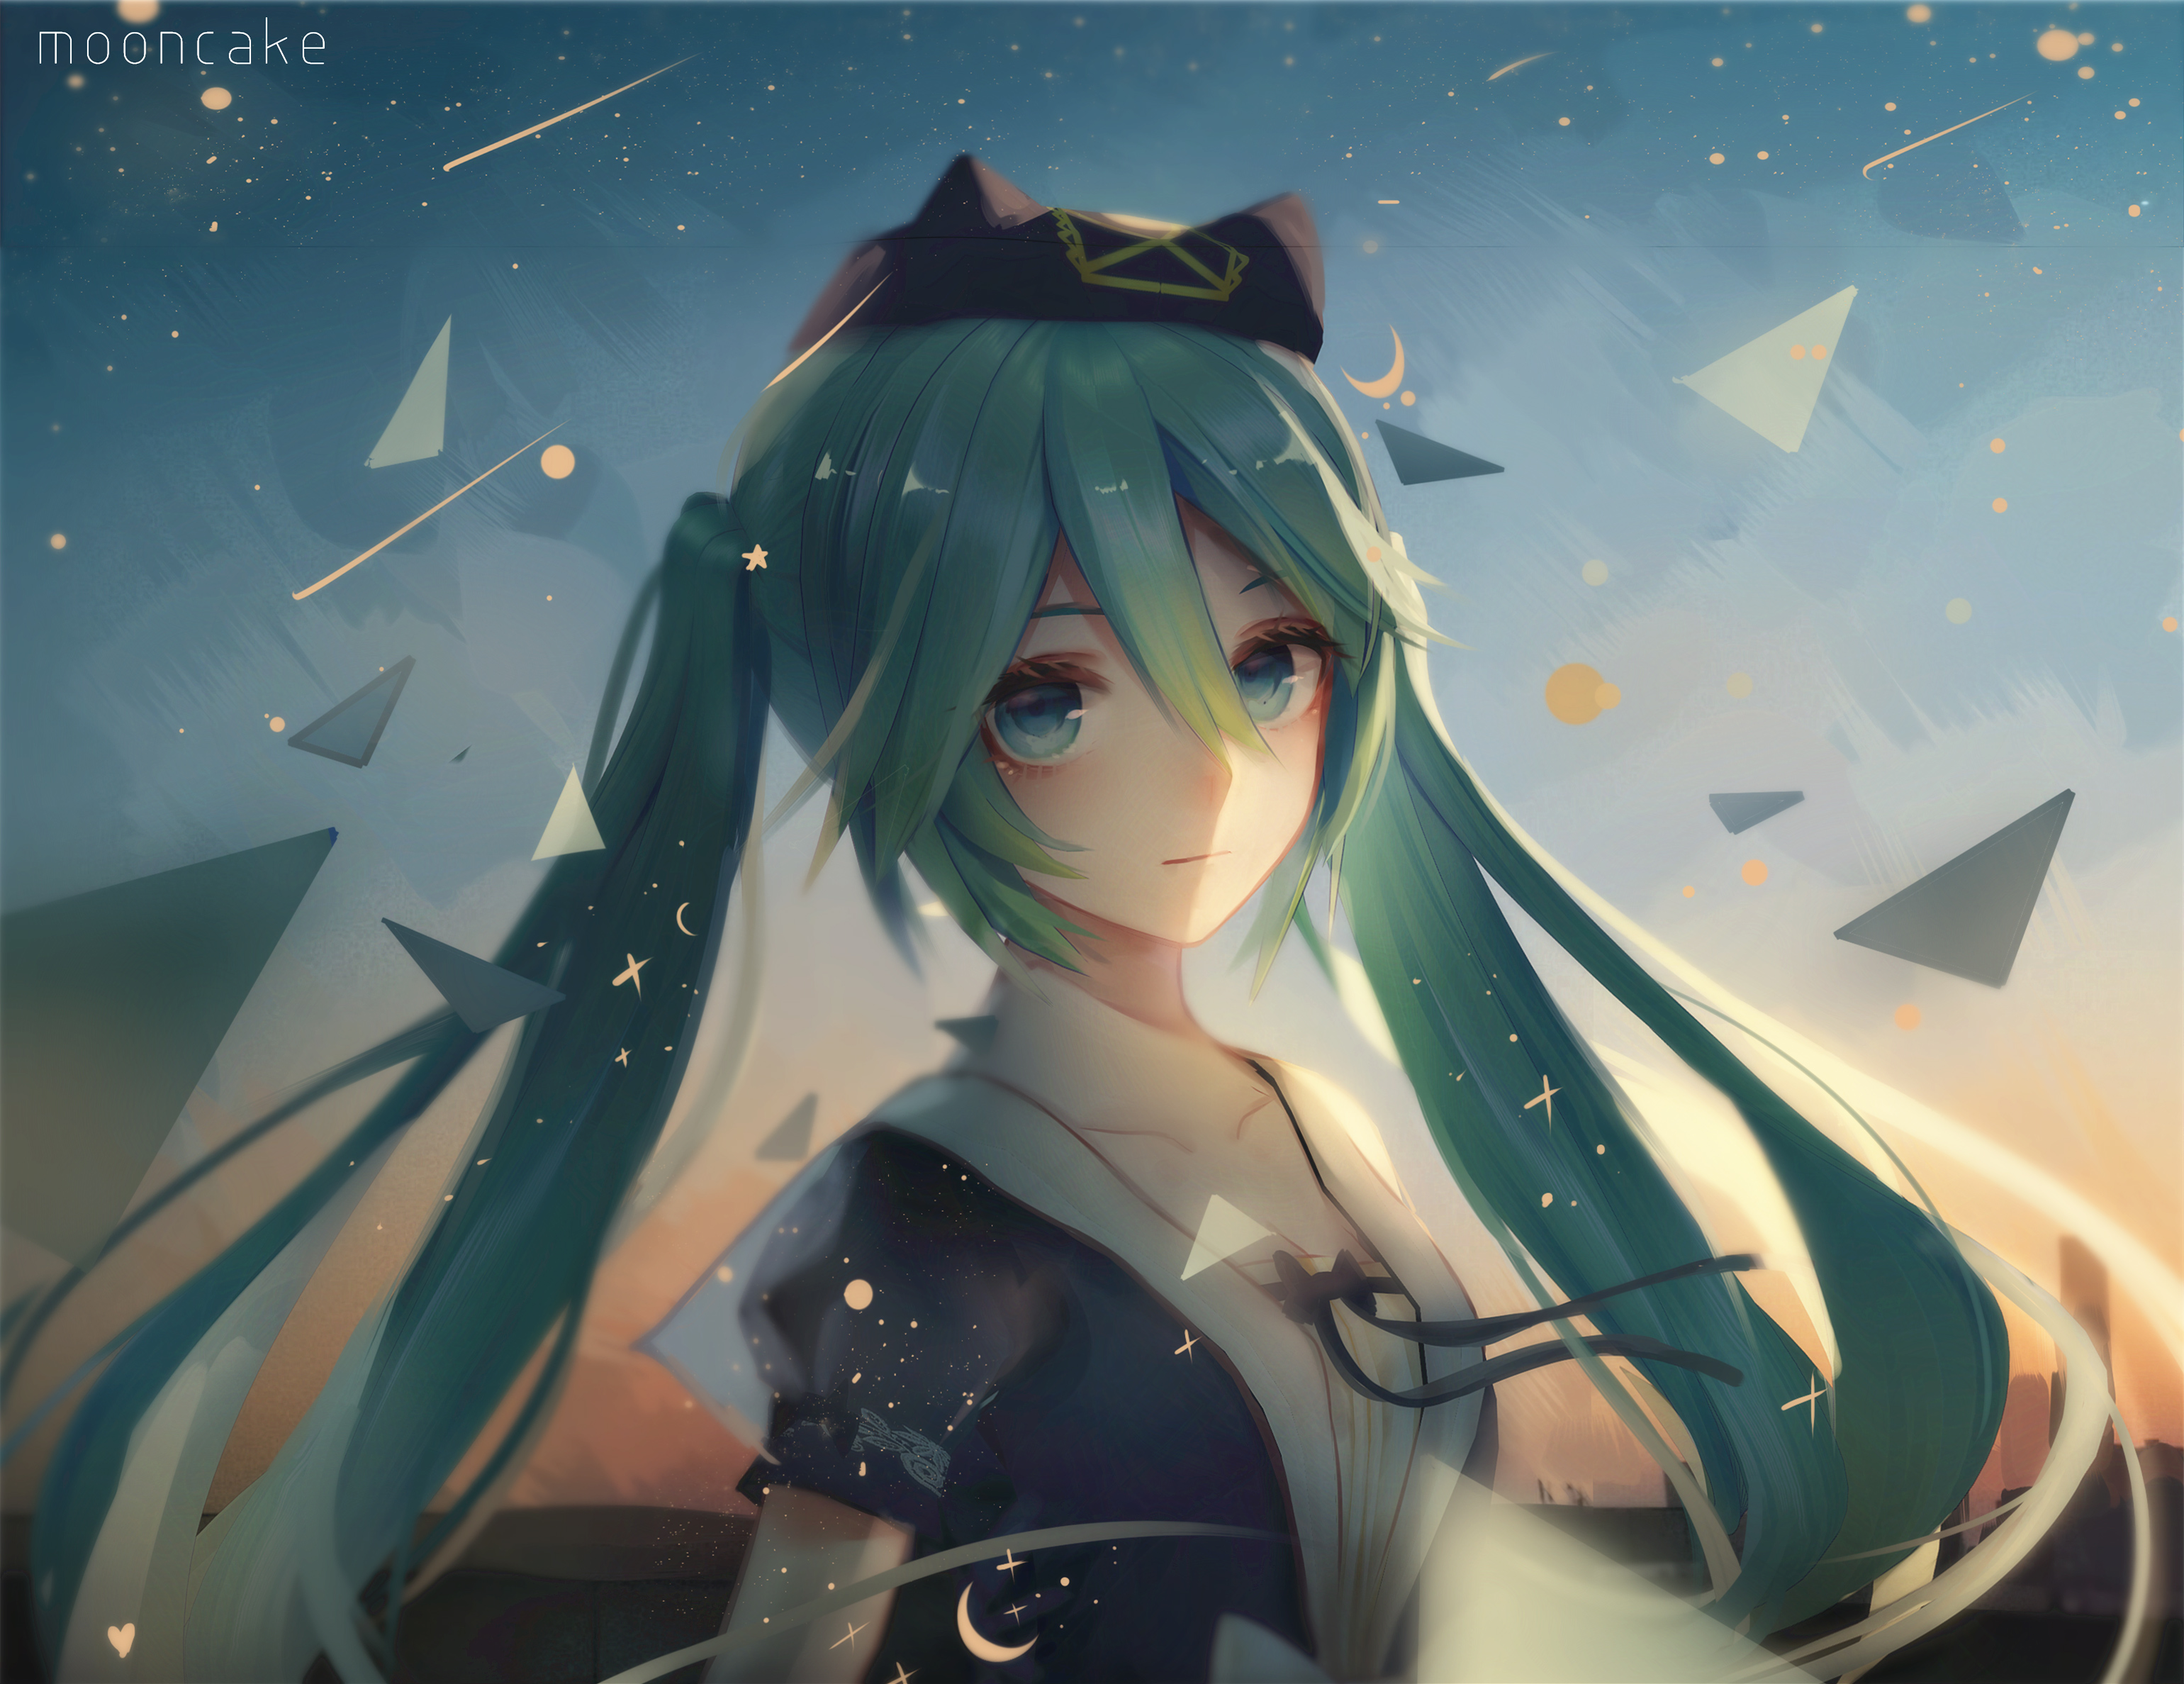 Hatsune Miku Vocaloid Anime 4k, HD Anime, 4k Wallpapers ...